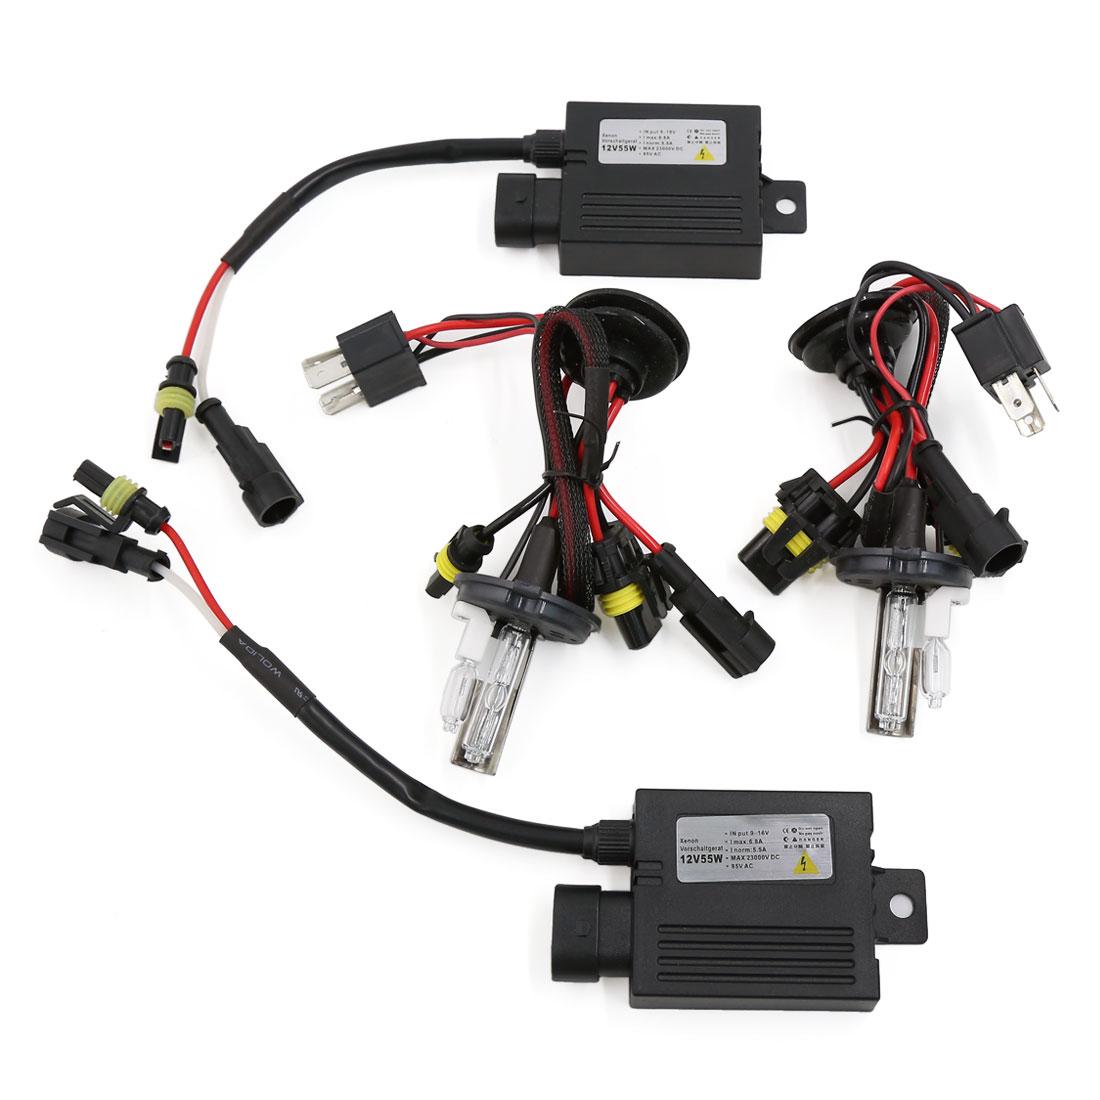 6000K H4 Hi/Lo Dual Beam HID Xenon Bulb Headlight Slim Conversion Kit DC 12V 55W